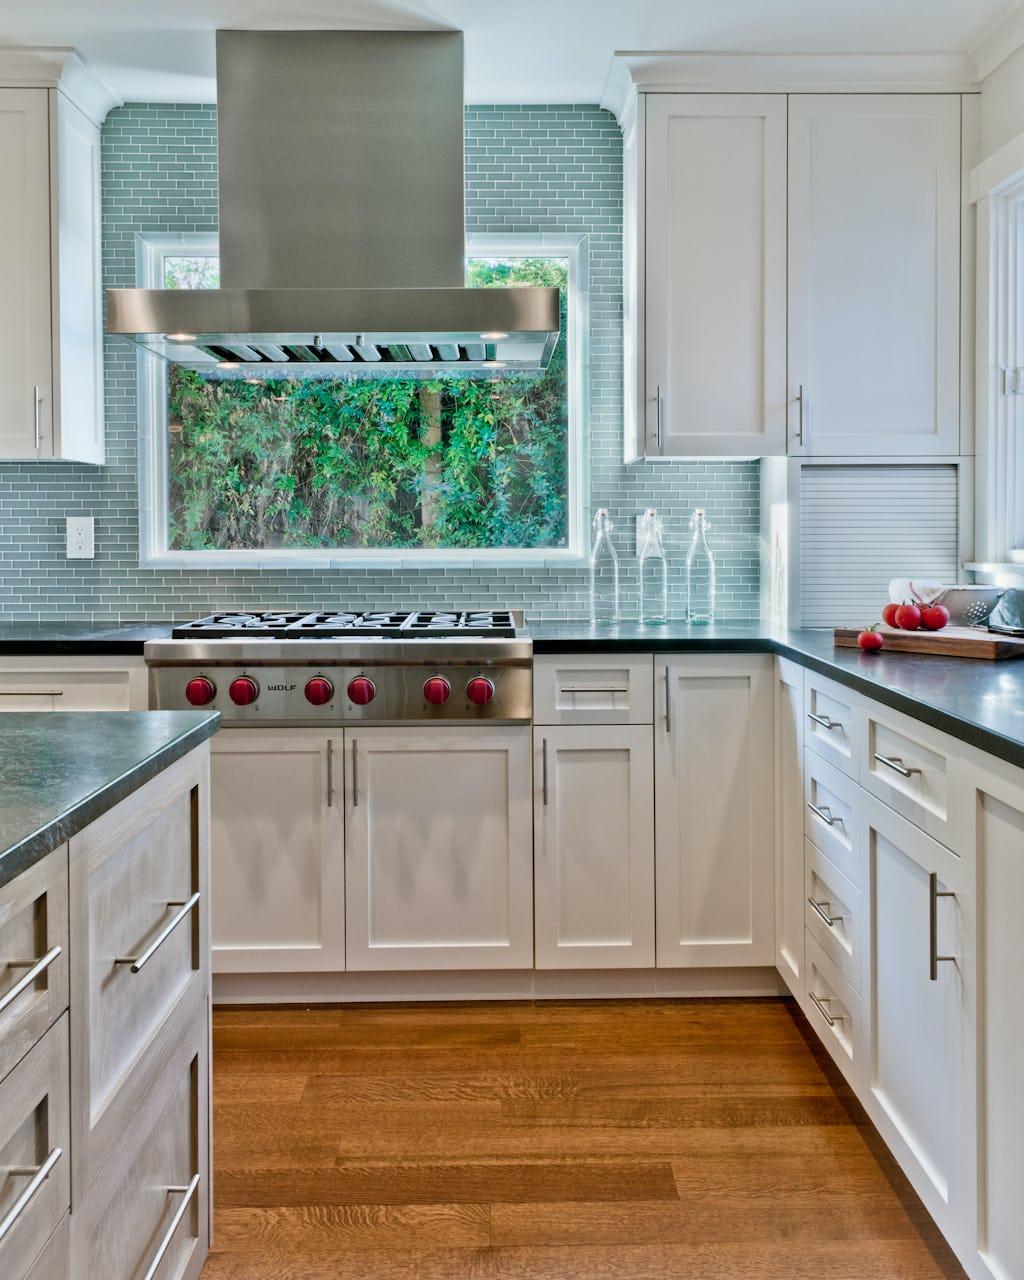 Studio karliova south court remodel interior design kitchen 2